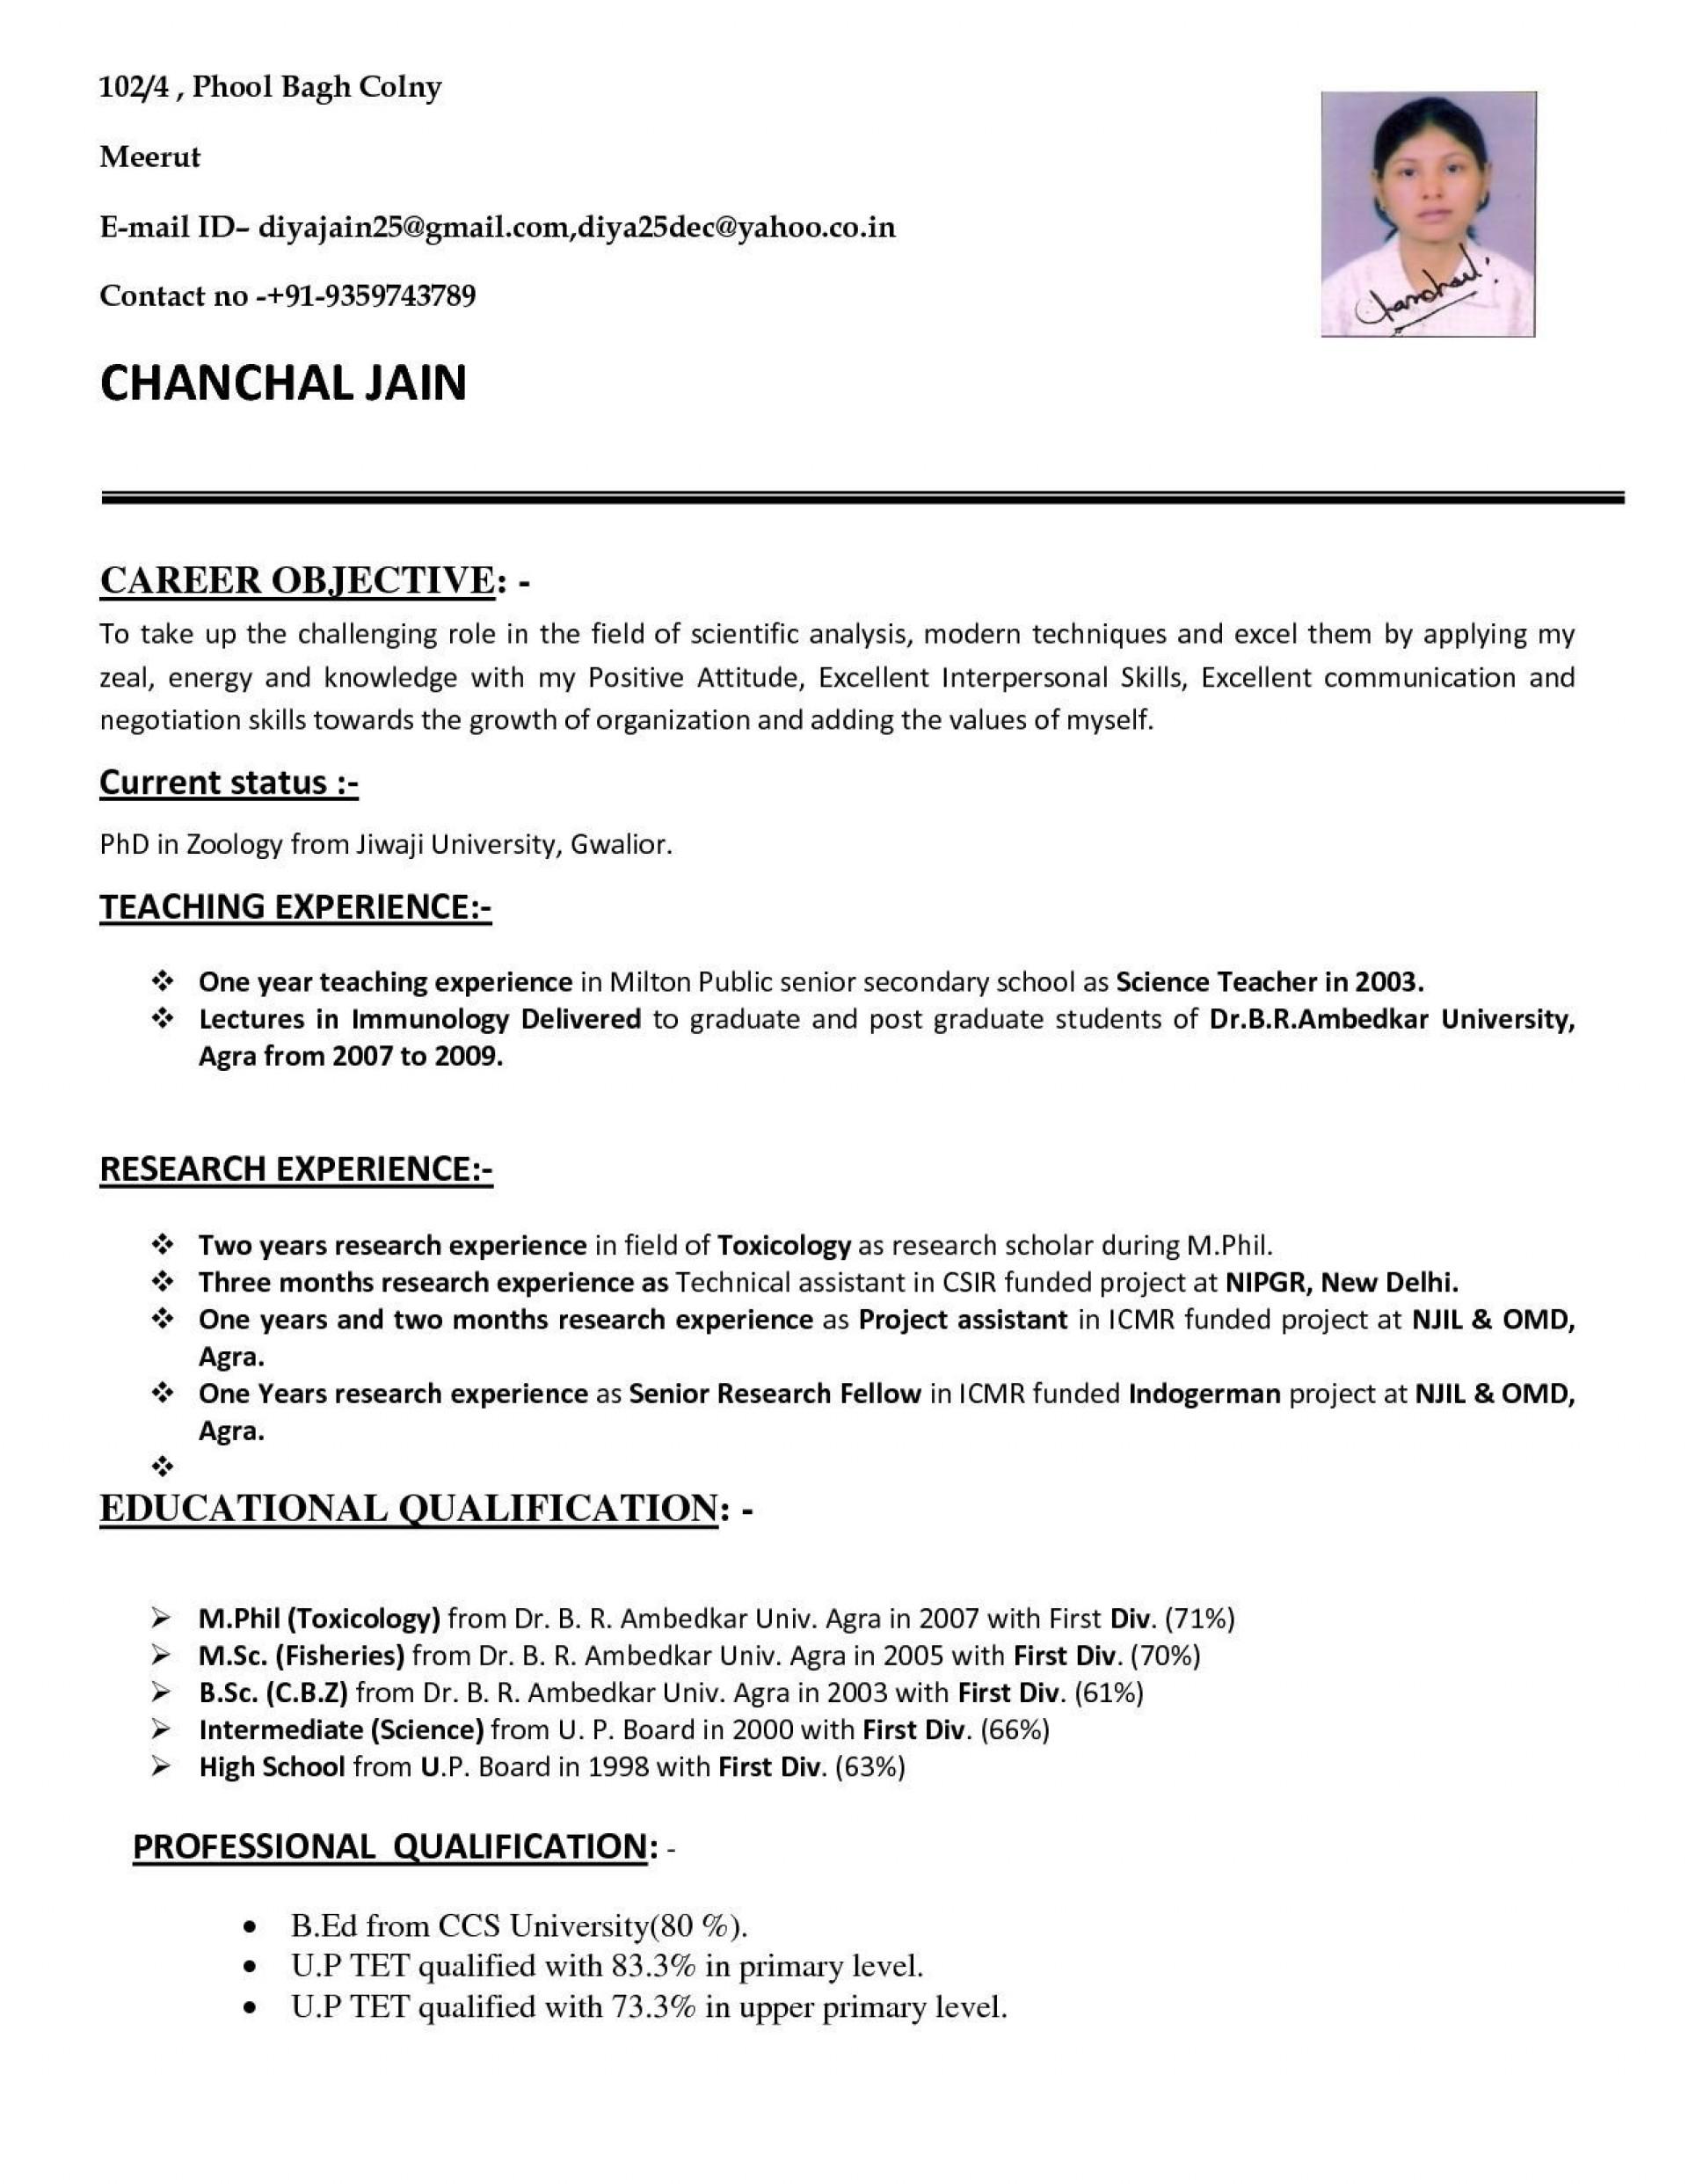 001 Amazing Cv Template For Teacher Job Inspiration  Example Education Sample Computer1920